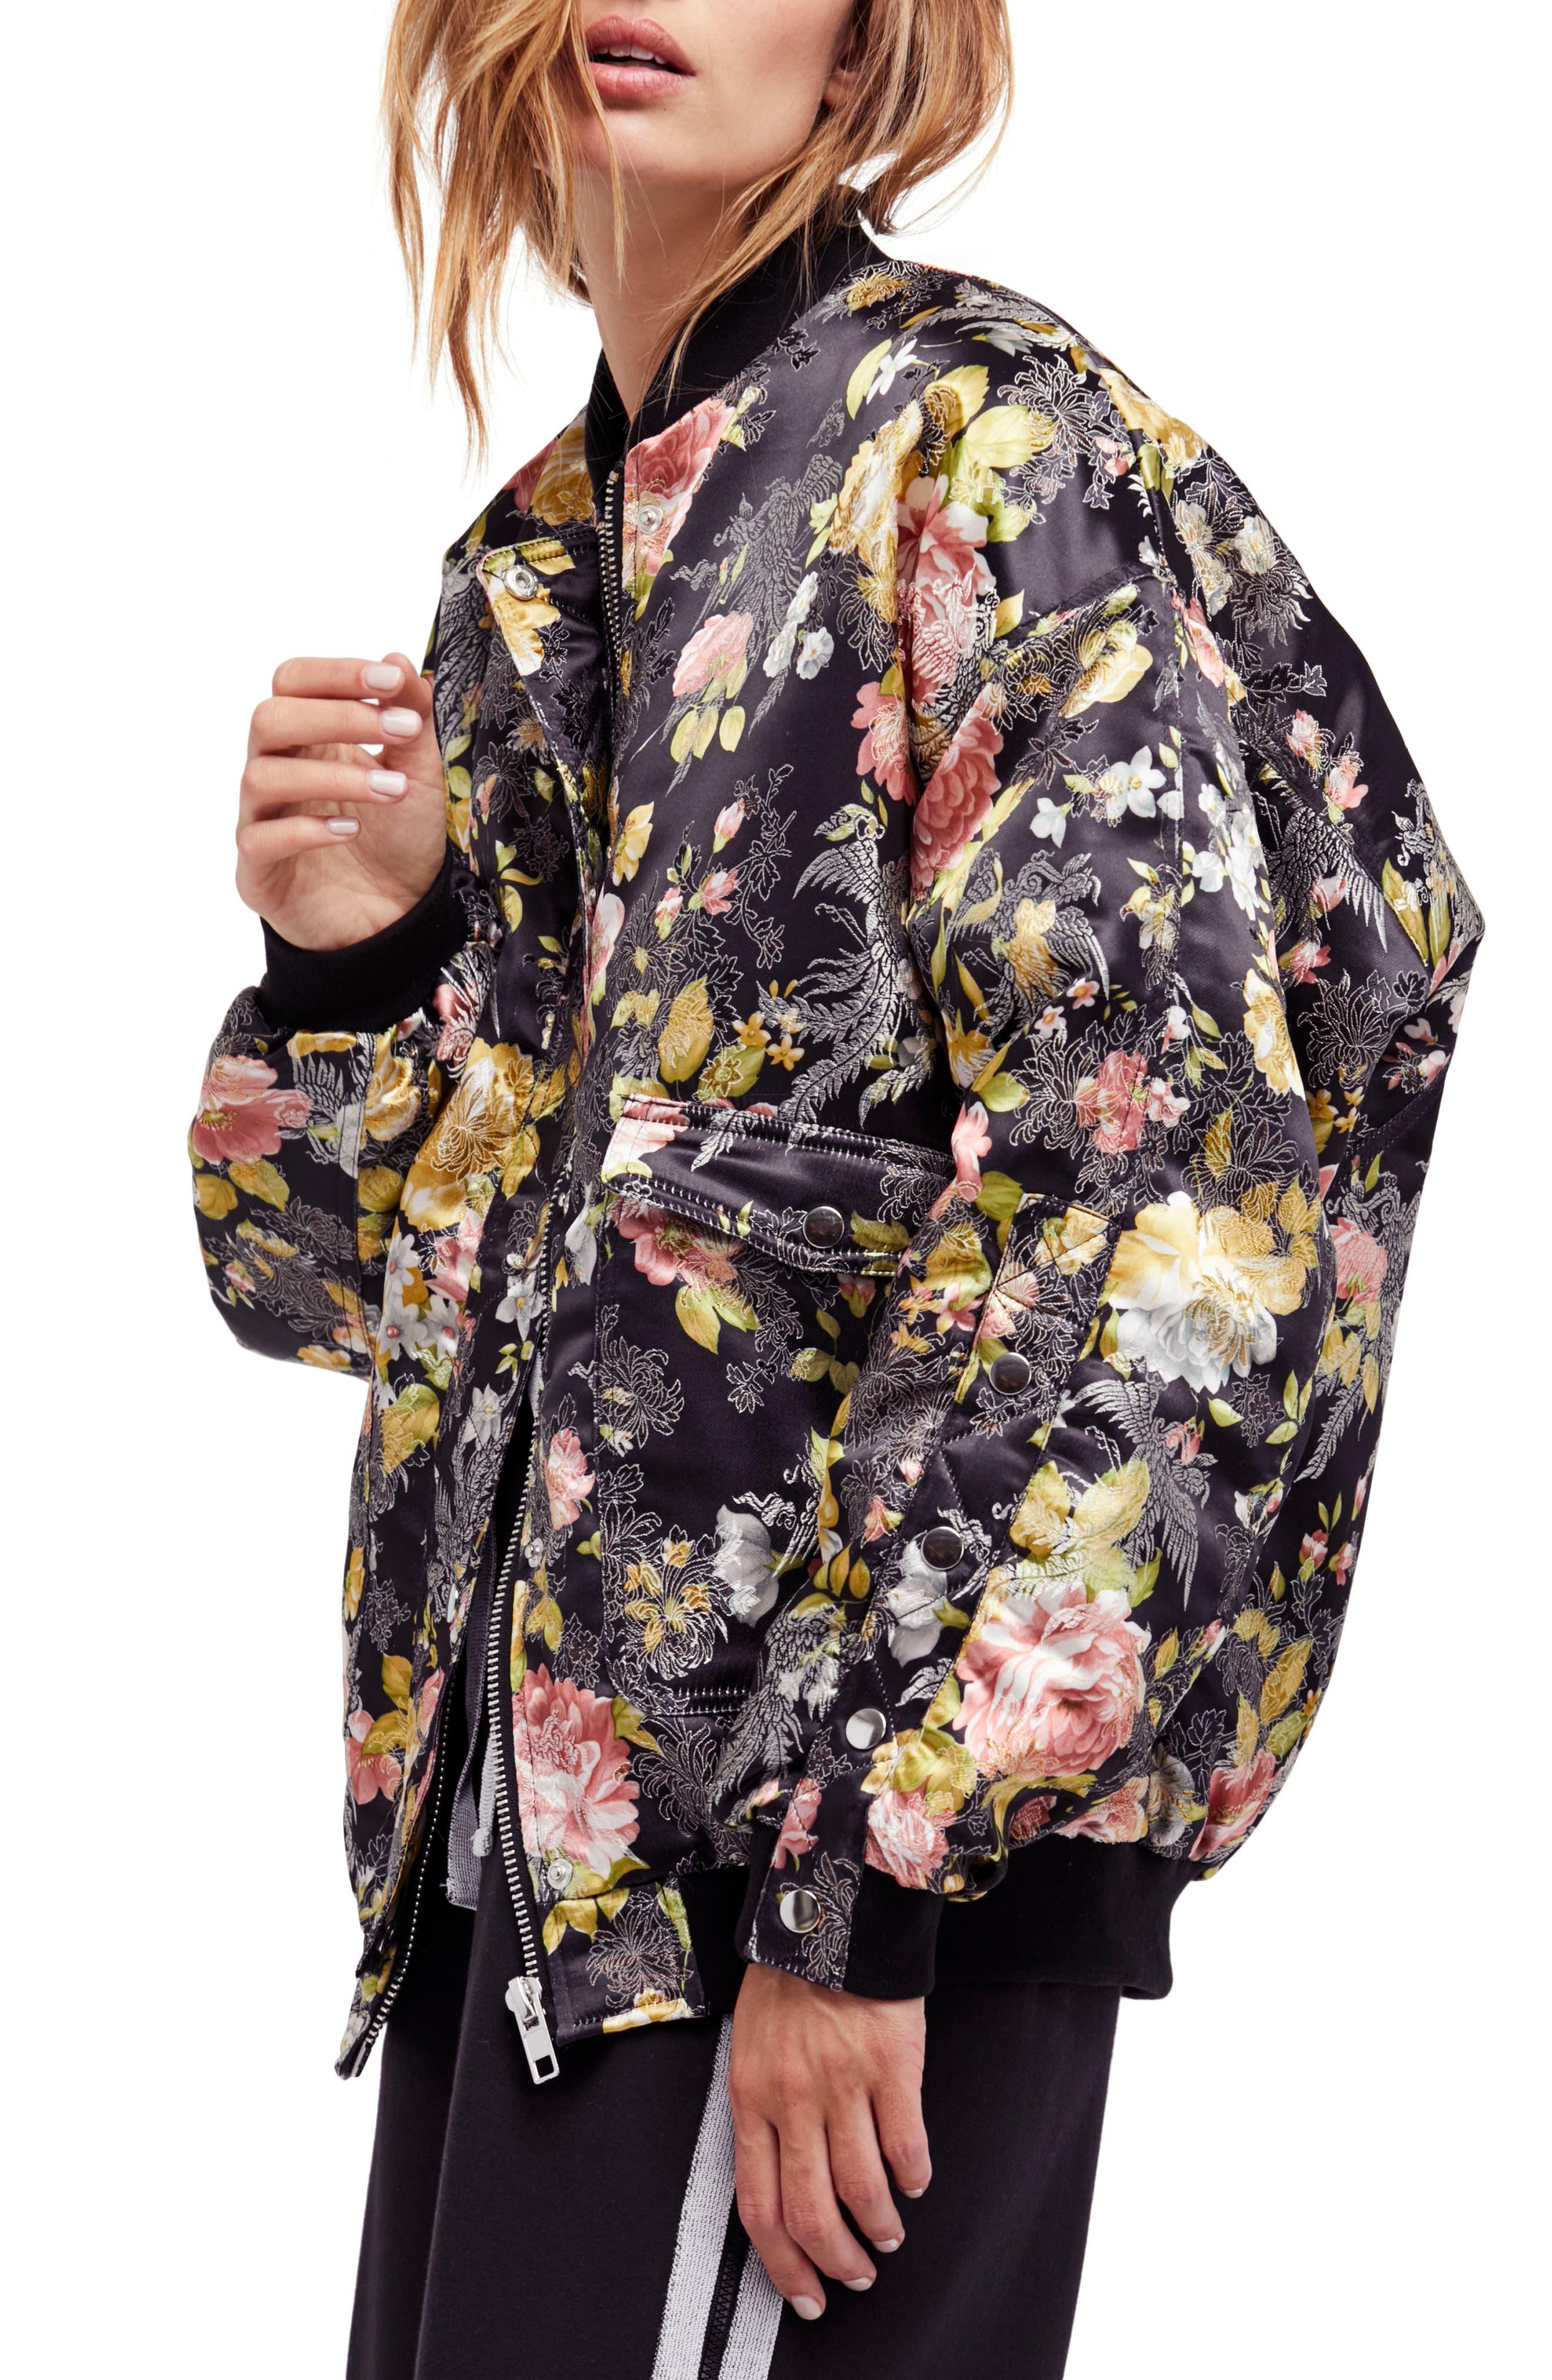 Free People Floral Jacquard Bomber Jacket